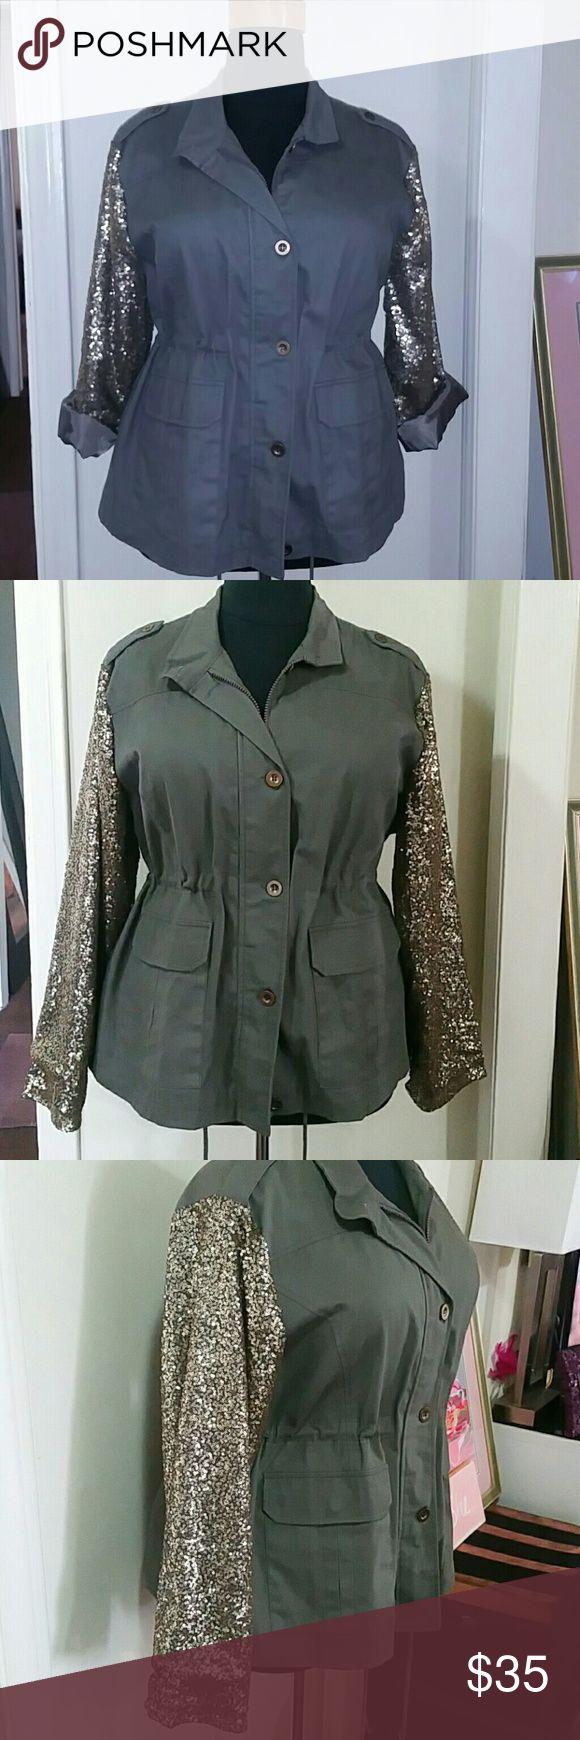 Ashley Stewart Sequin Parker Military green parker jacket with sequin sleeves Ashley Stewart Jackets & Coats